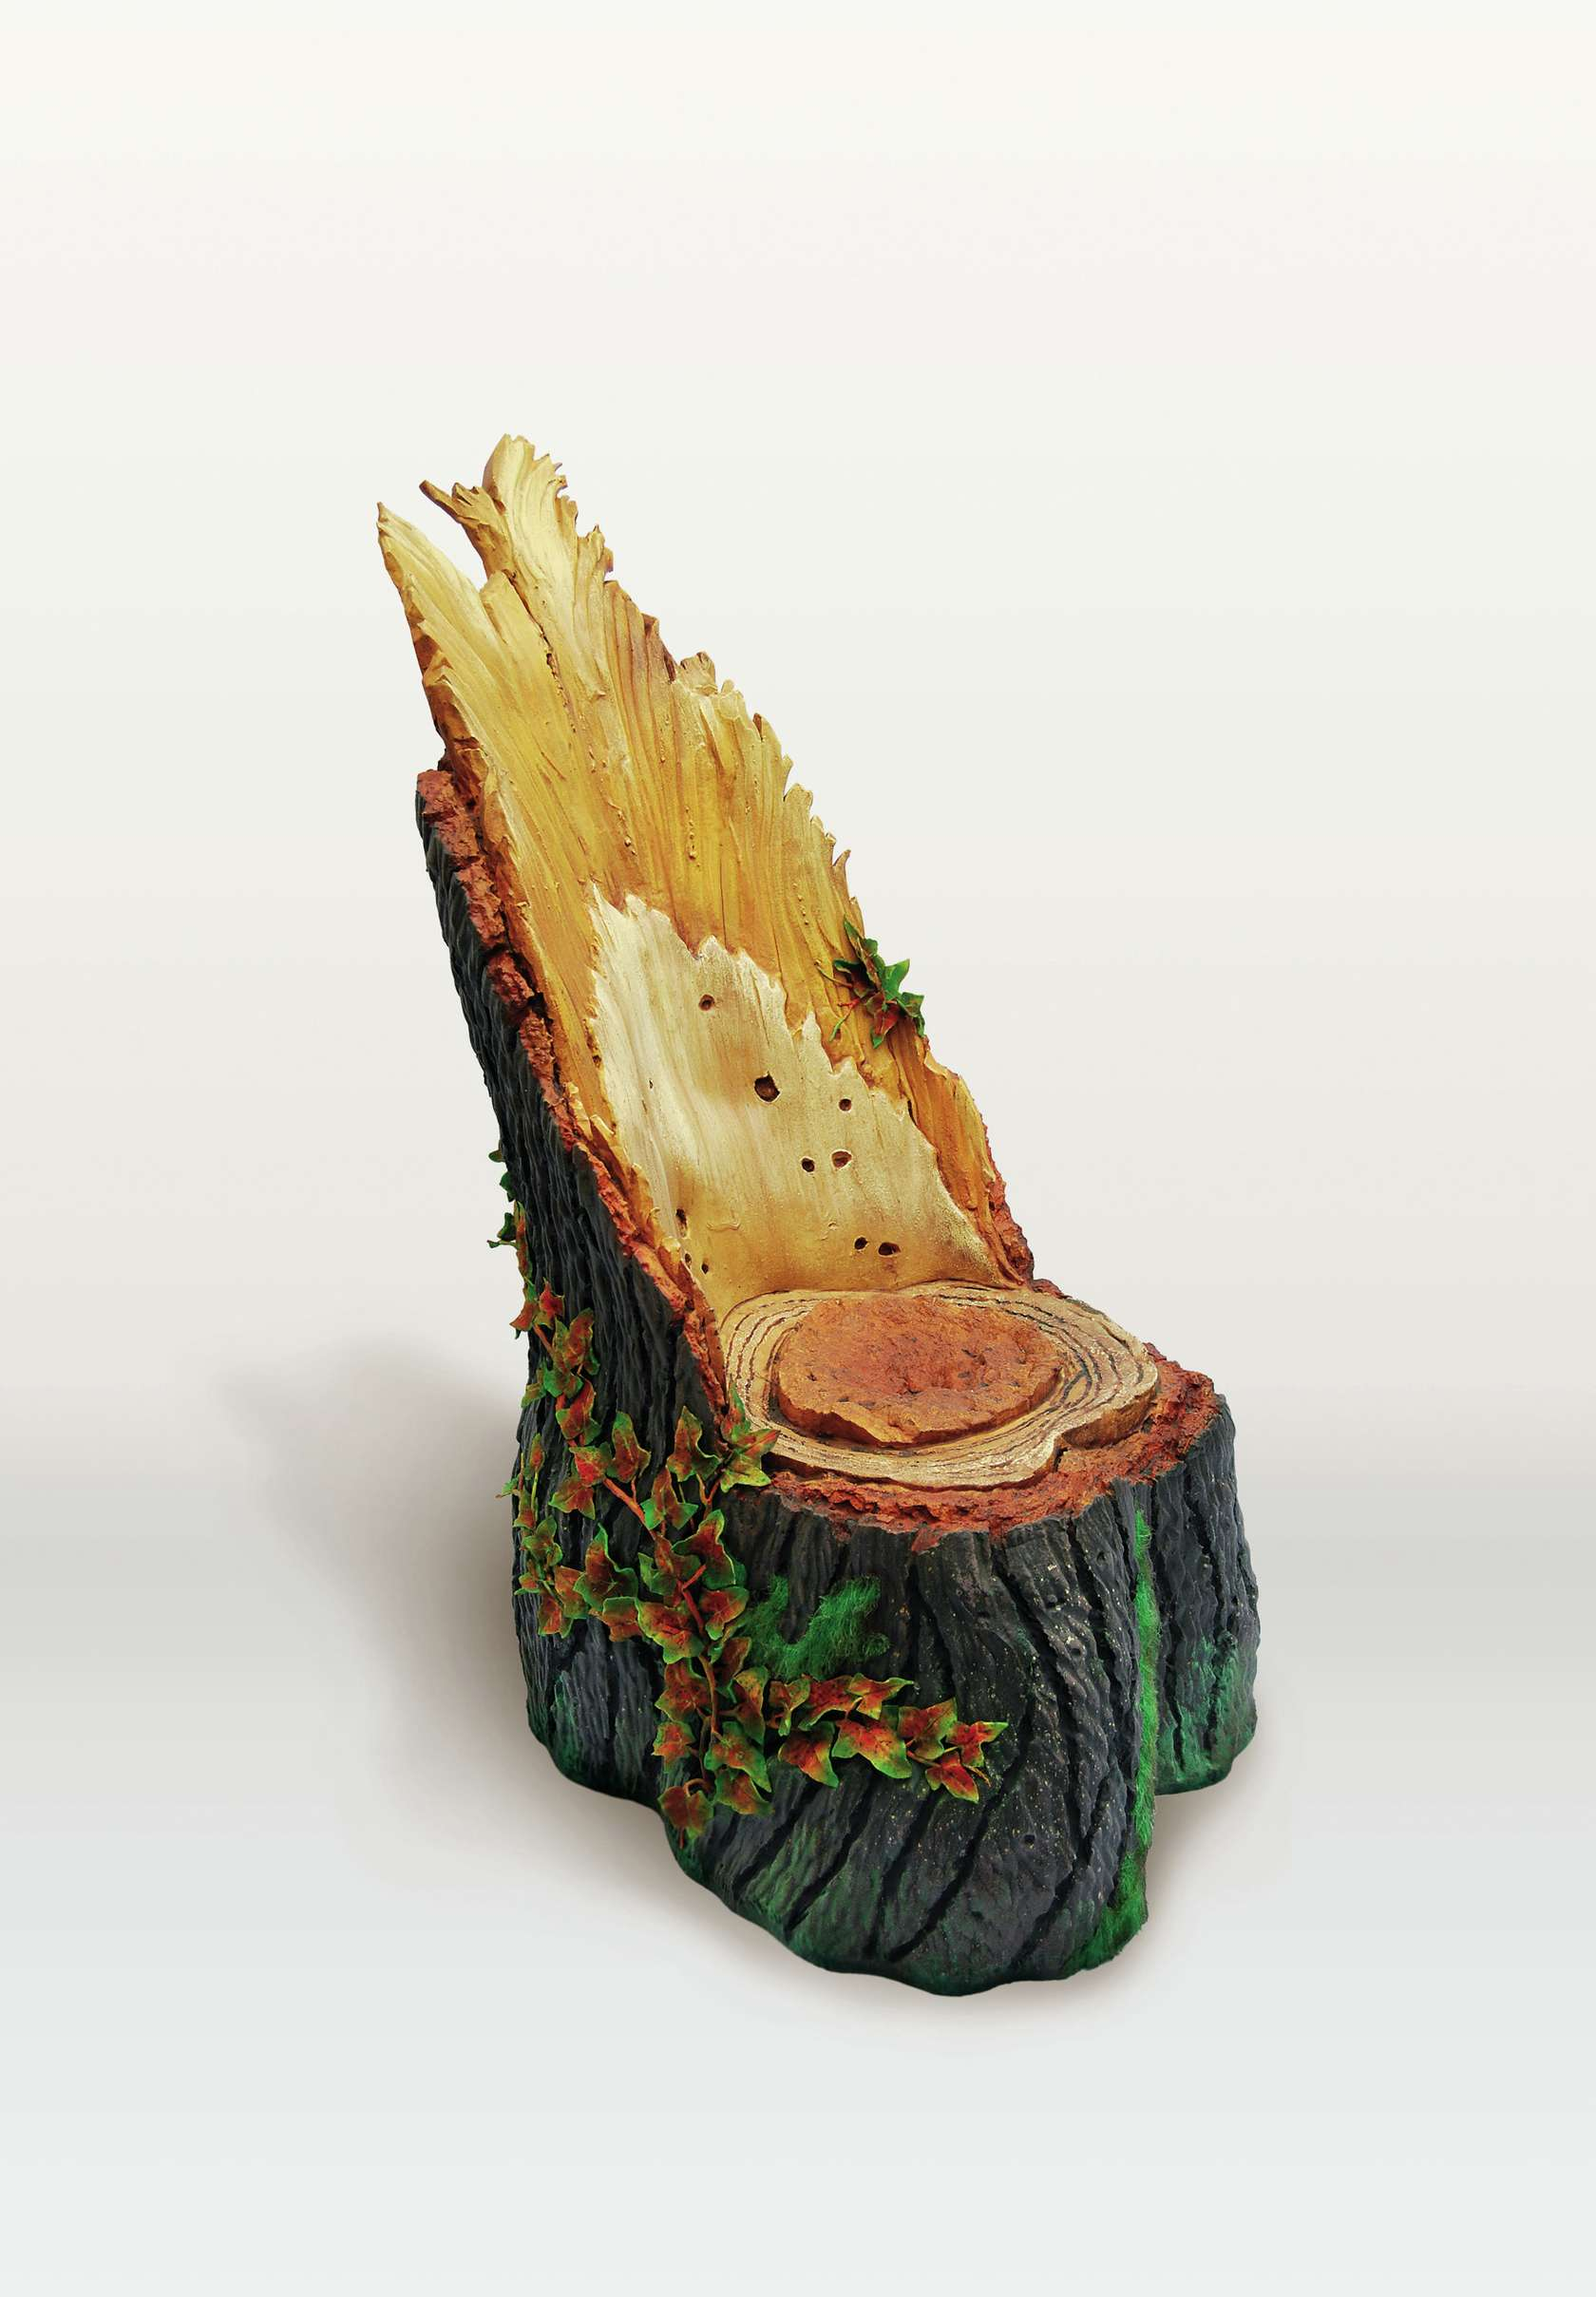 Piero Gilardi, Tronco-Sedile, 2009 Mousse de polyuréthane140 × 80 × 100 cm / 55 1/8 × 31 1/2 × 39 3/8 in.